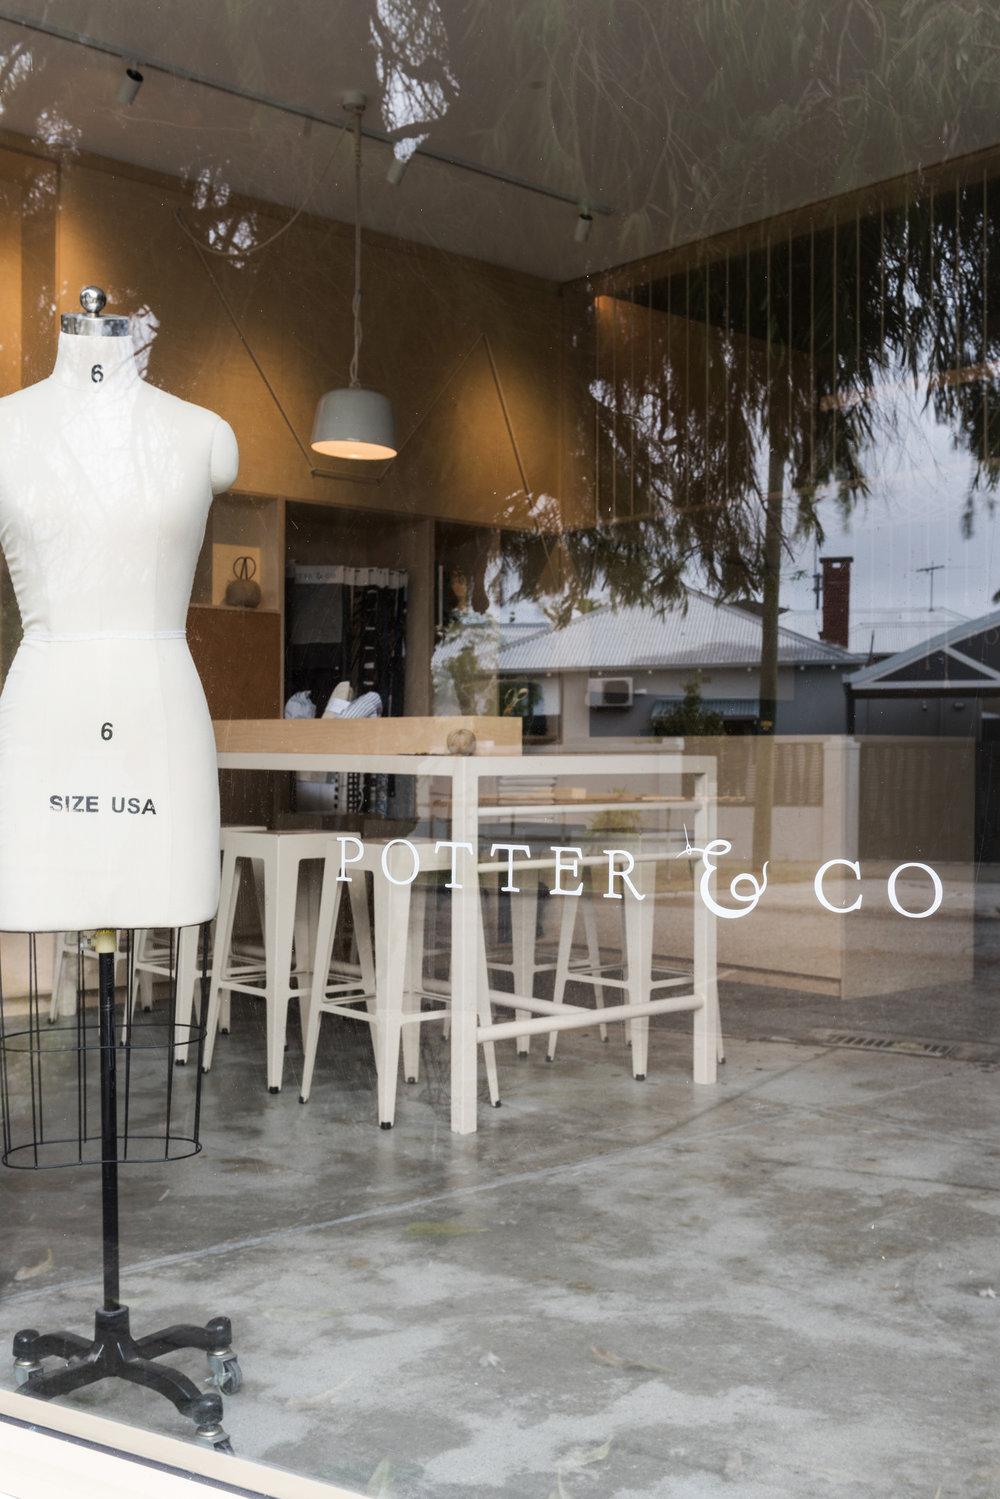 shopfront photograph